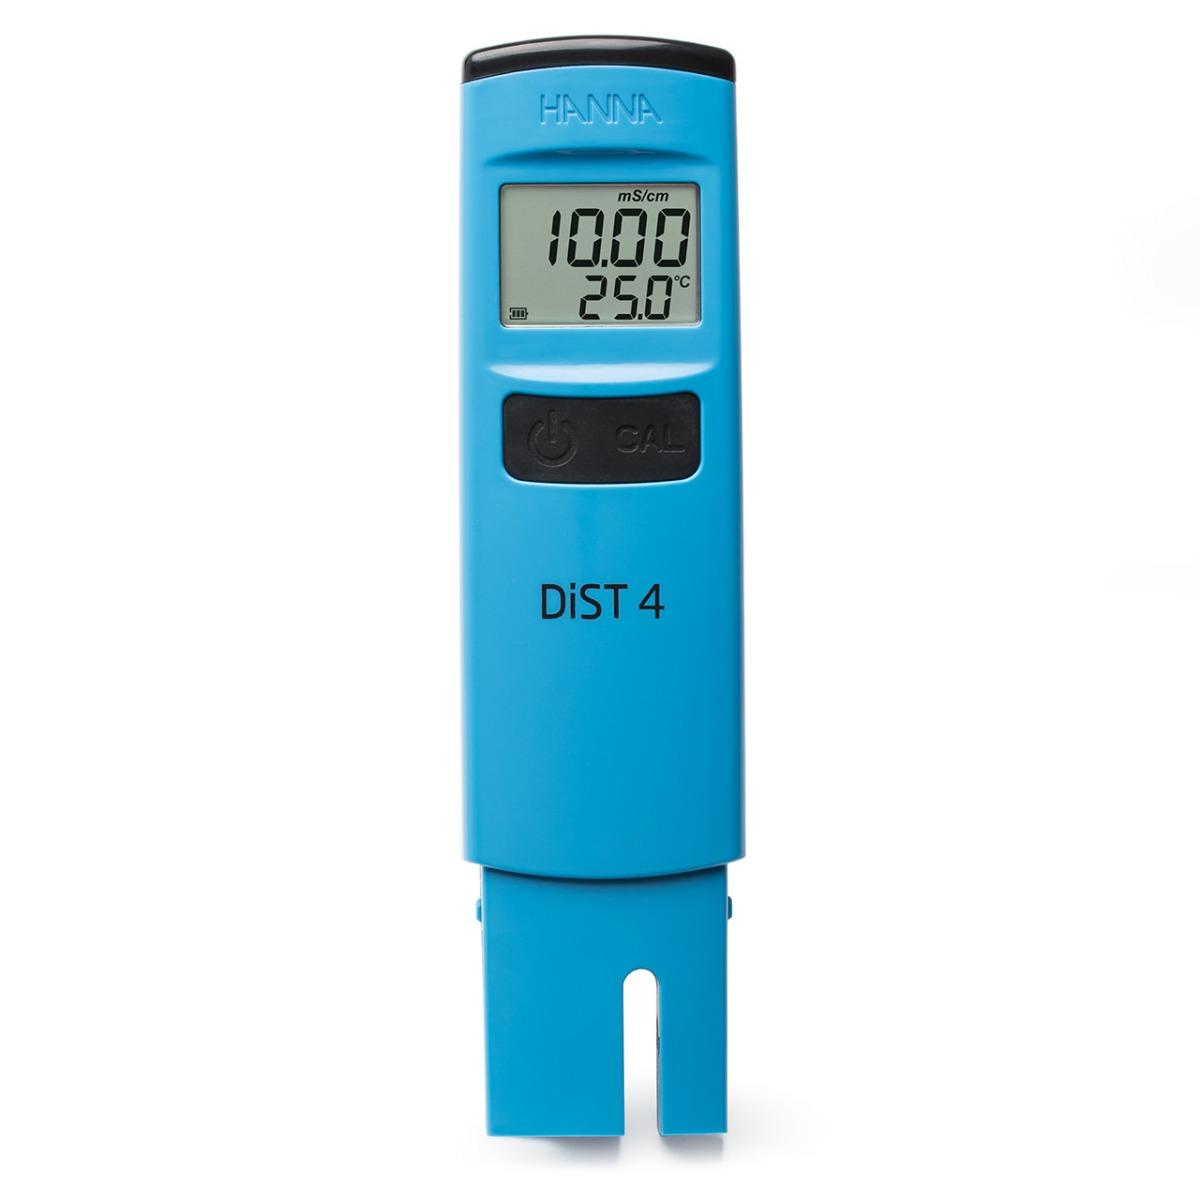 HI98304 - DiST®4 - conduttivimetro tascabile, EC scala alta (20 mS/cm)